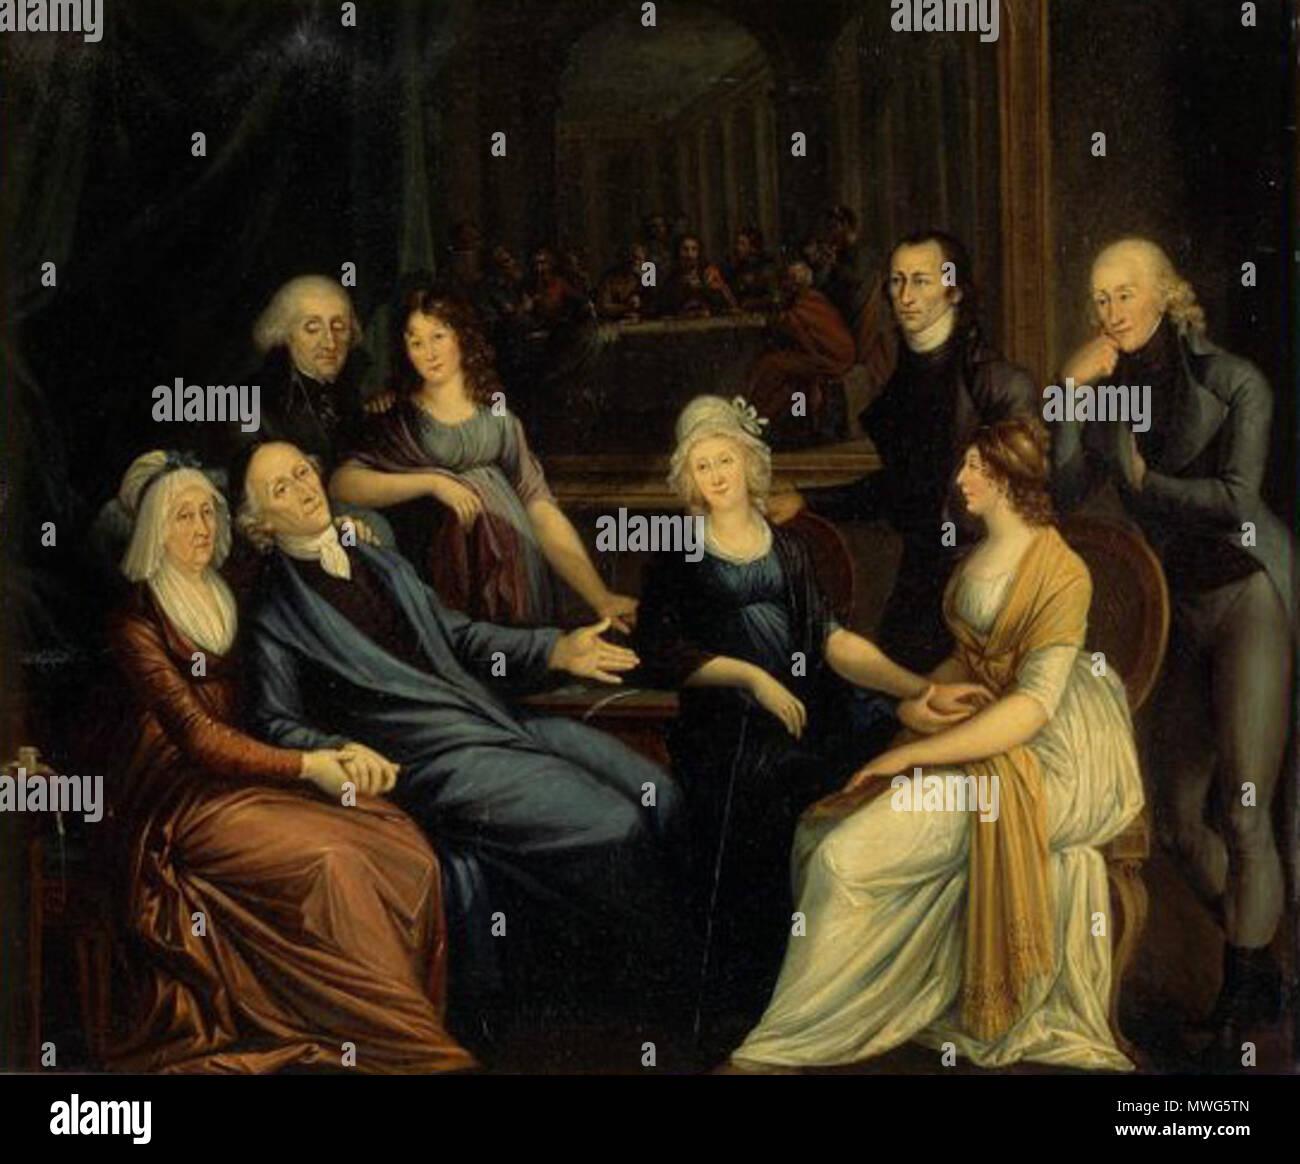 . Lavaters Tod, die Familie ist am Berchtoldstag 1801 um den sterbenden Lavater versammelt . c. 1801-1825  361 Lavaters Tod - Stock Image